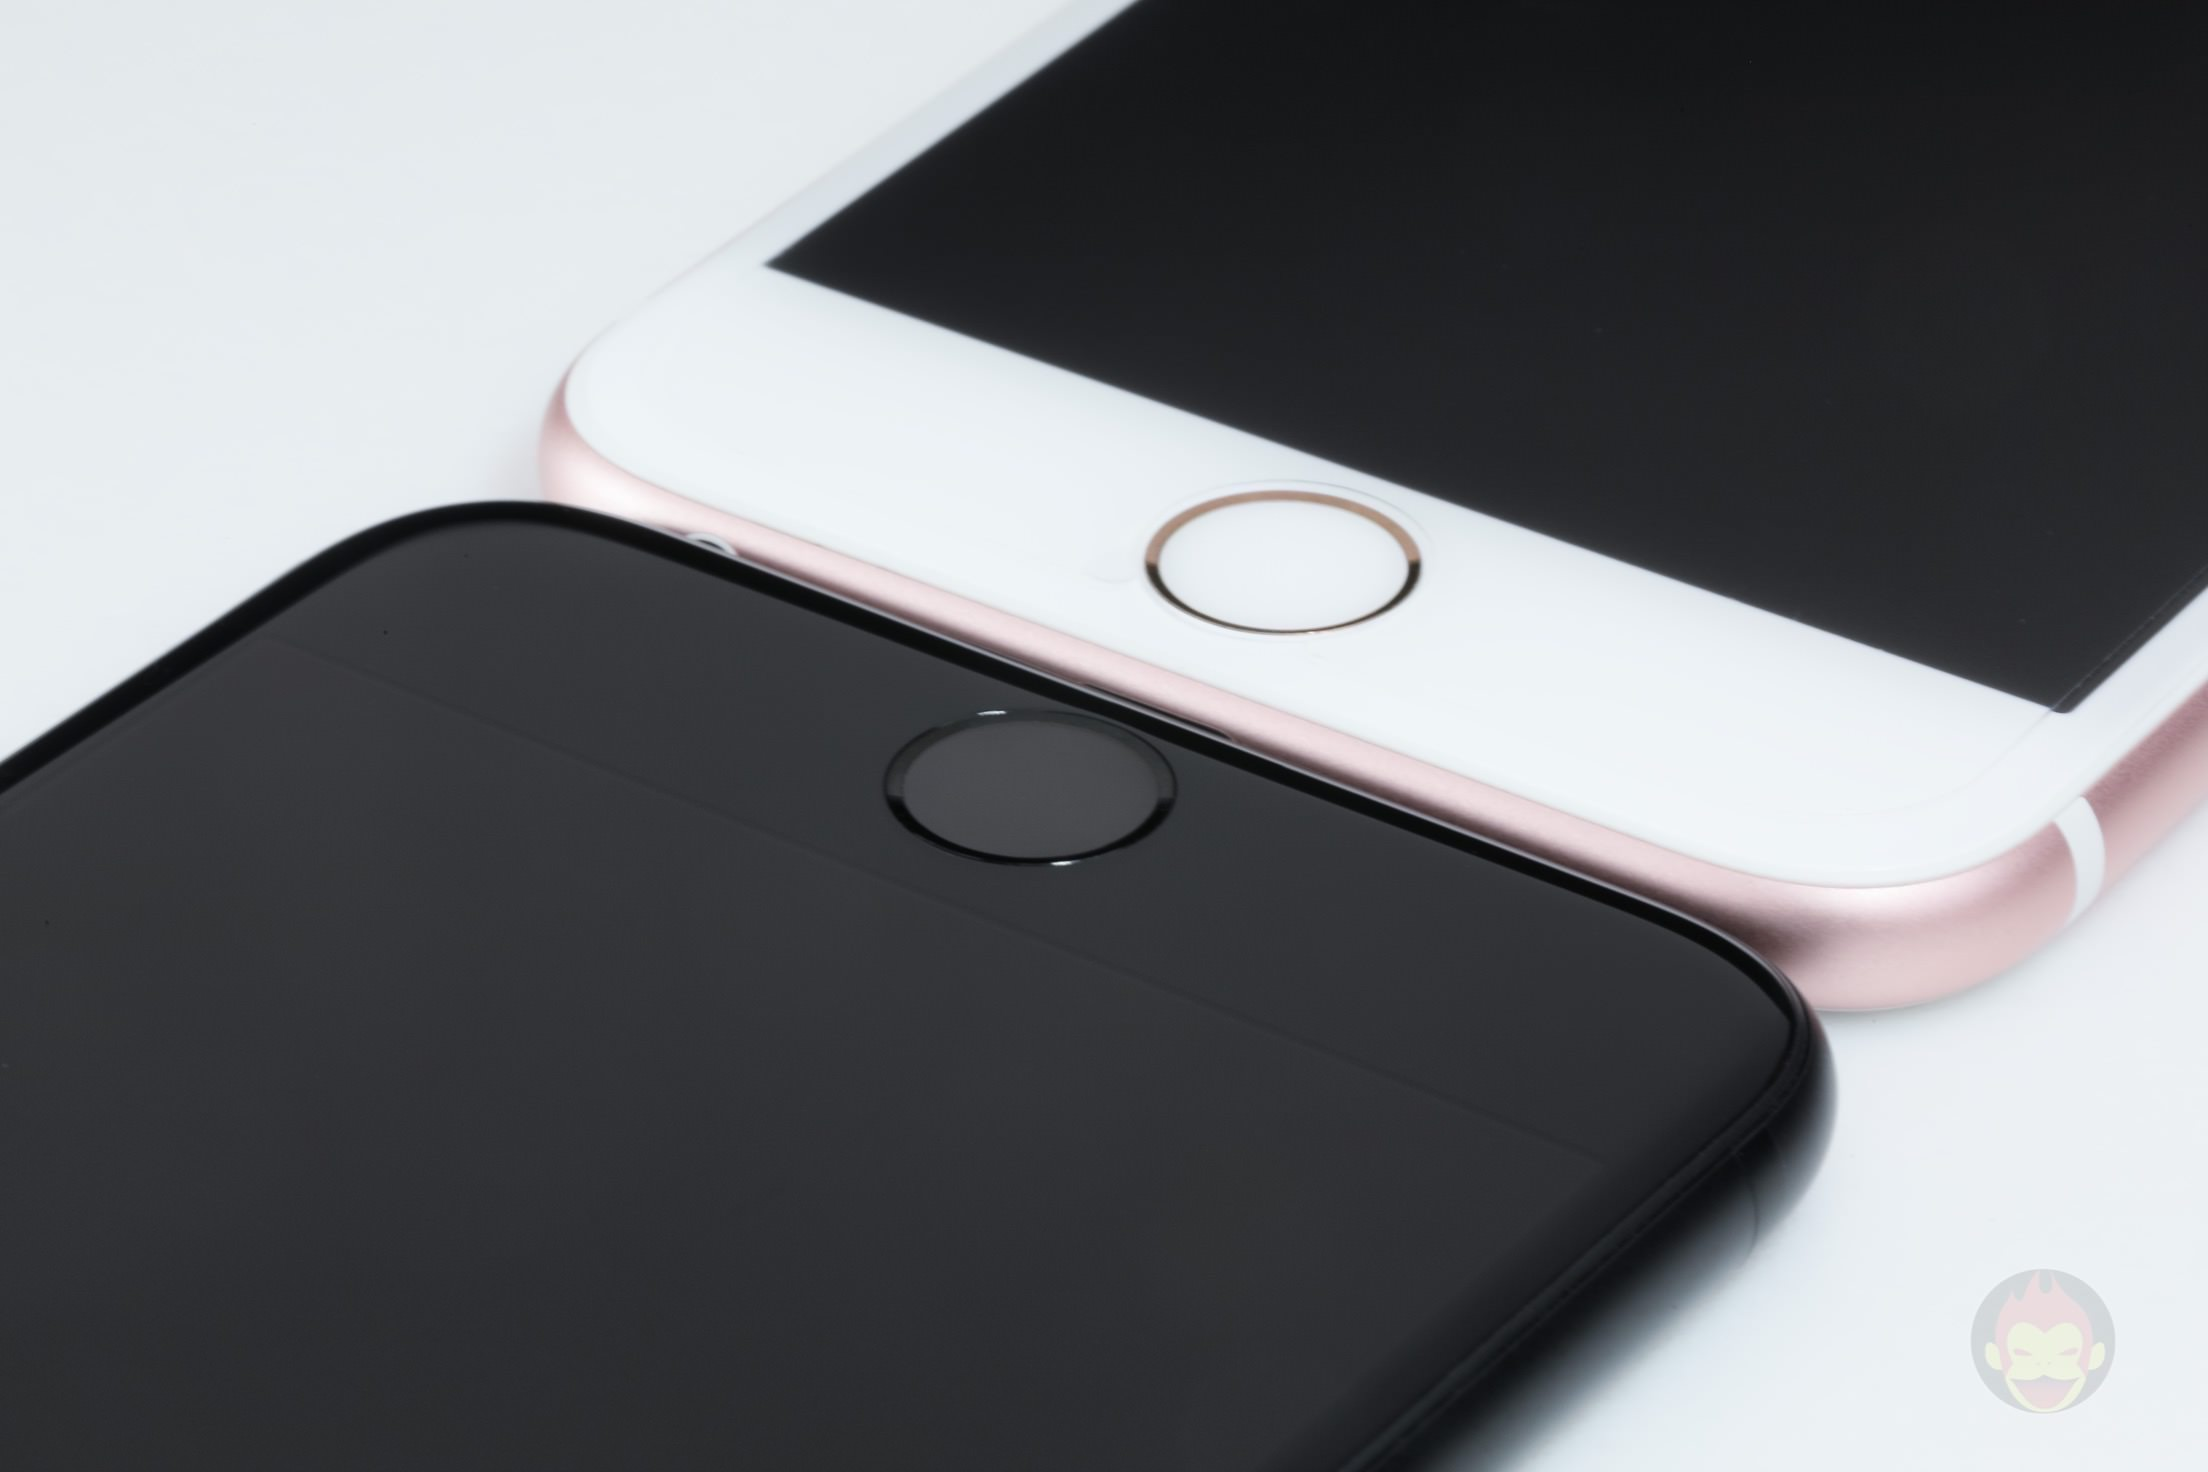 iPhone-7-iPhone-6s-Comparison-04.jpg